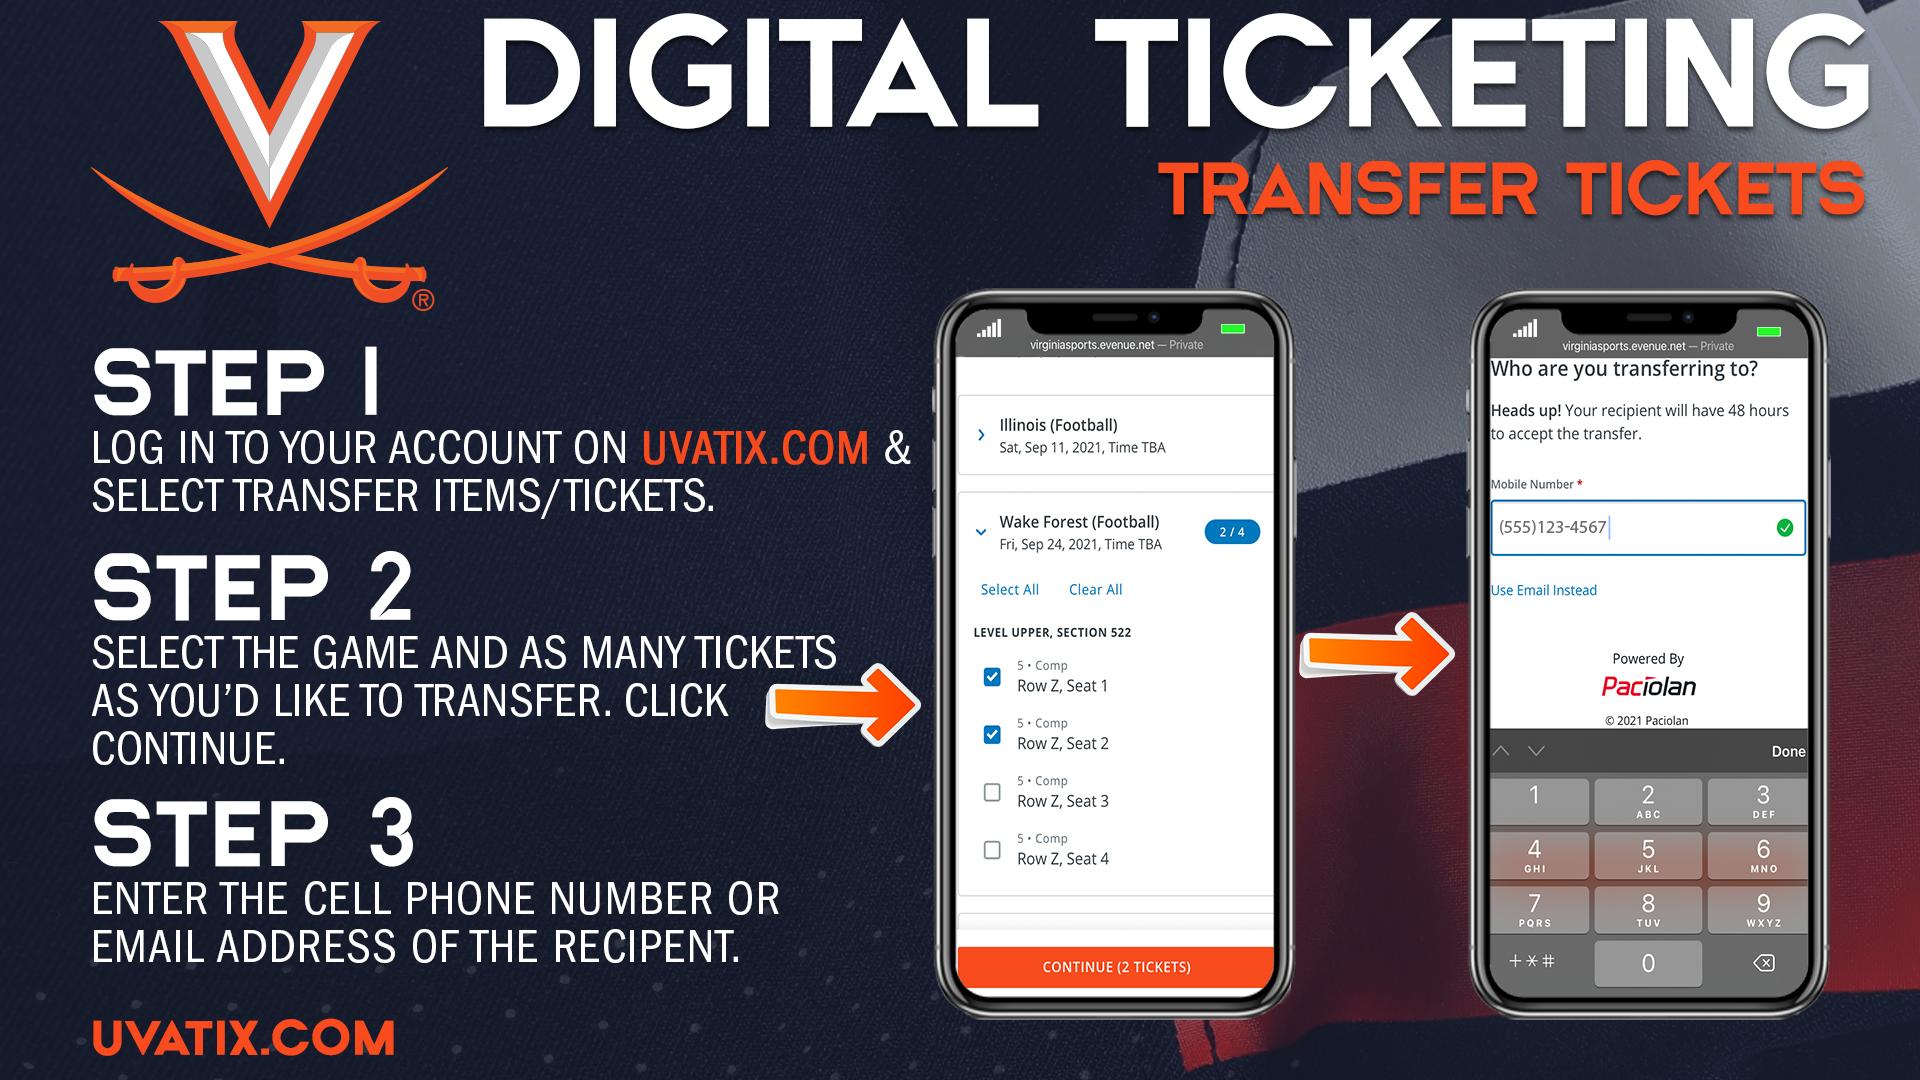 Transfer instructions - 1